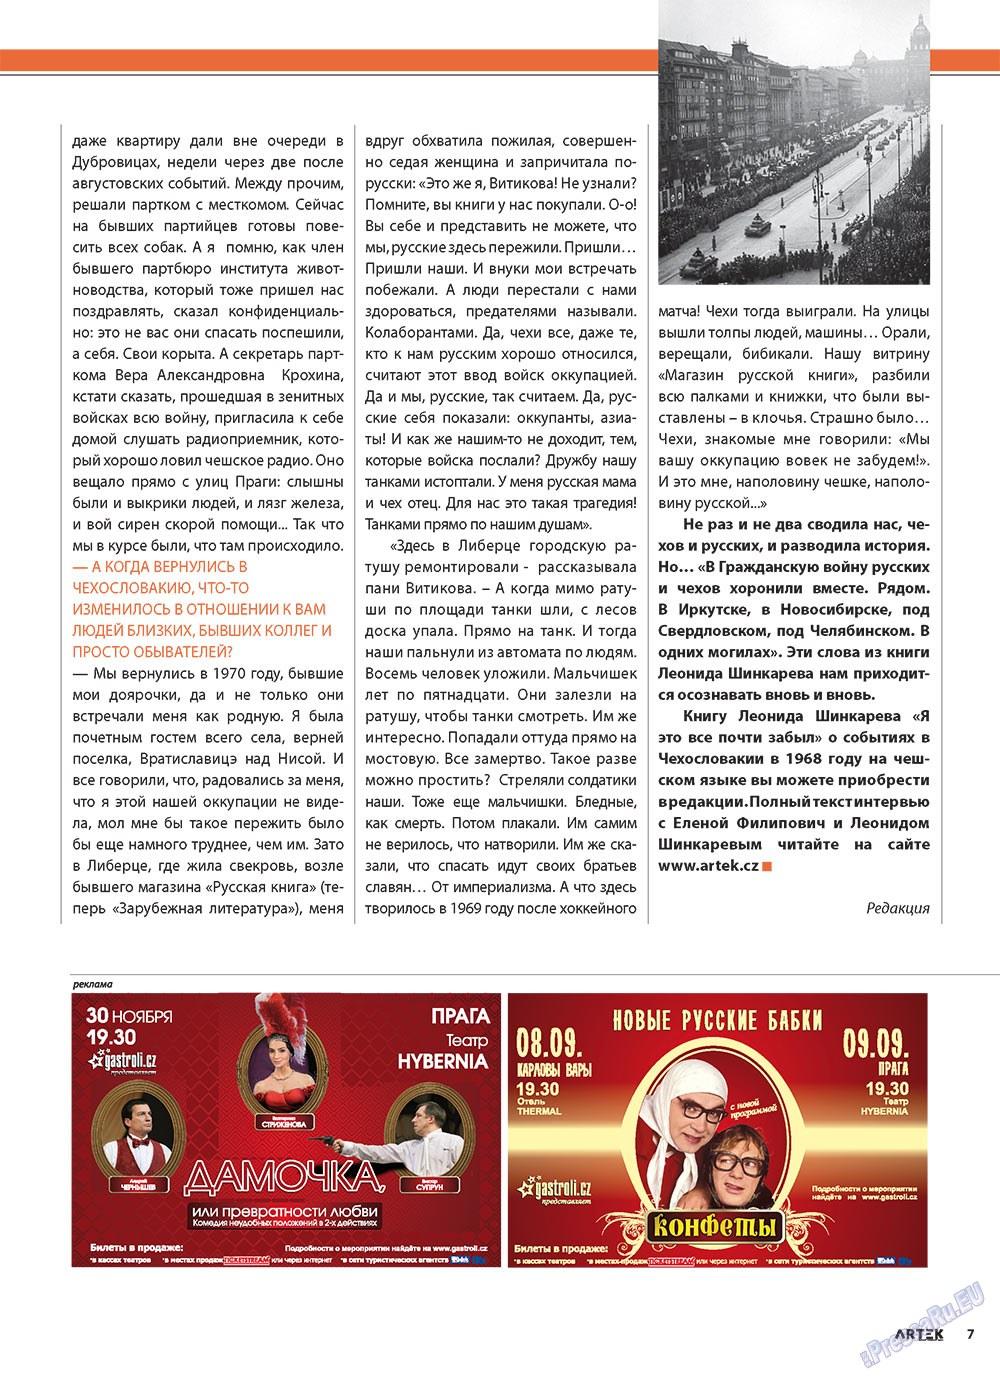 Артек (журнал). 2010 год, номер 4, стр. 9